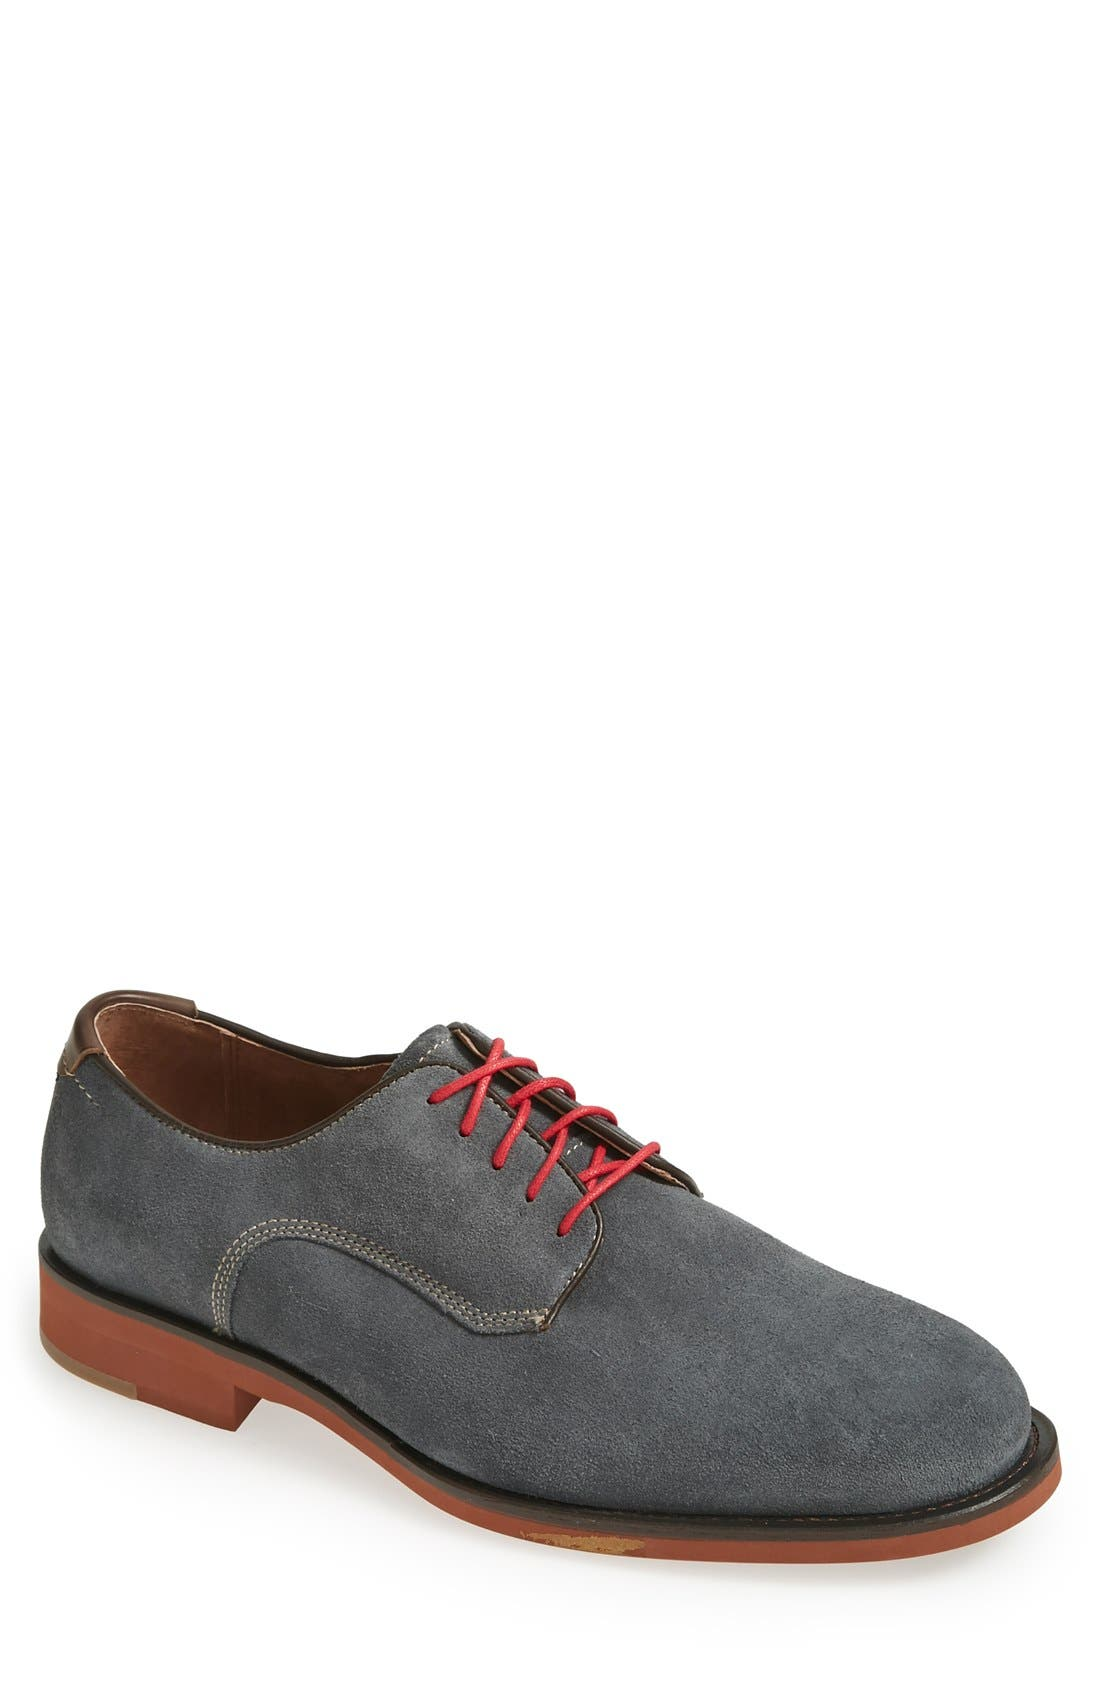 'Ellington' Suede Buck Shoe,                         Main,                         color, 020